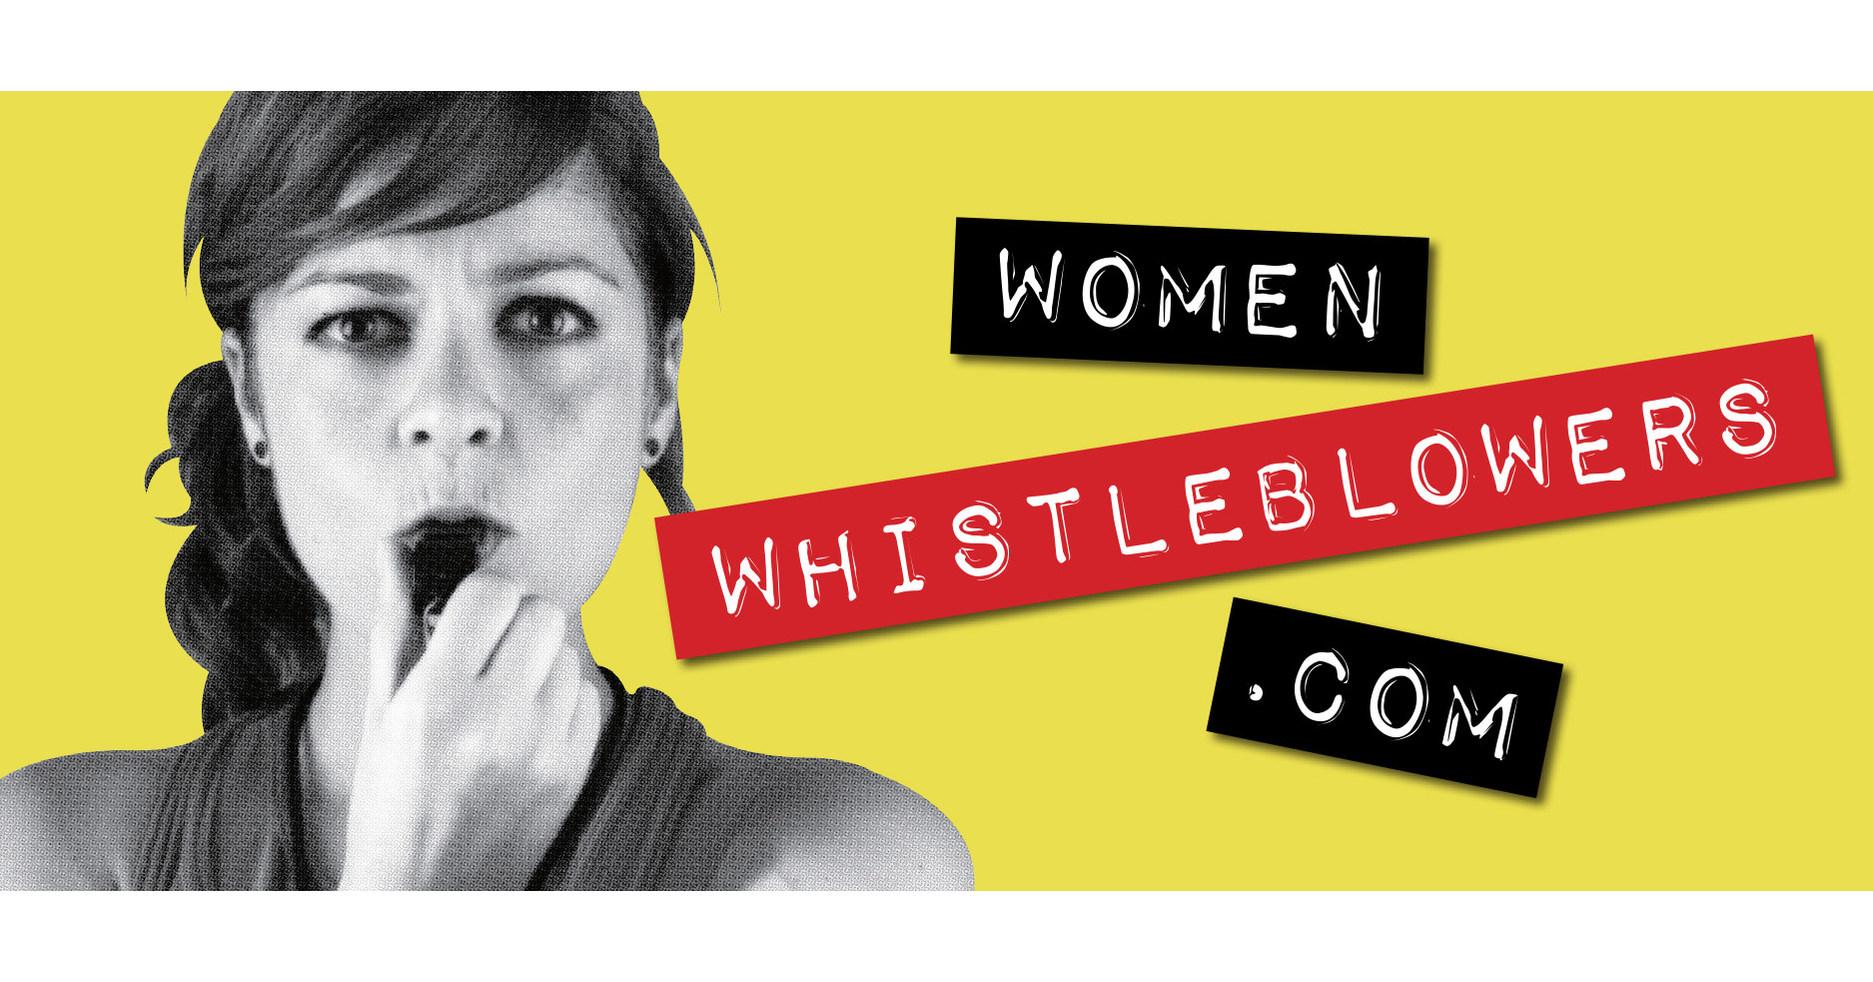 Women Whistleblowers Campaign Emphasizes Why Women Make